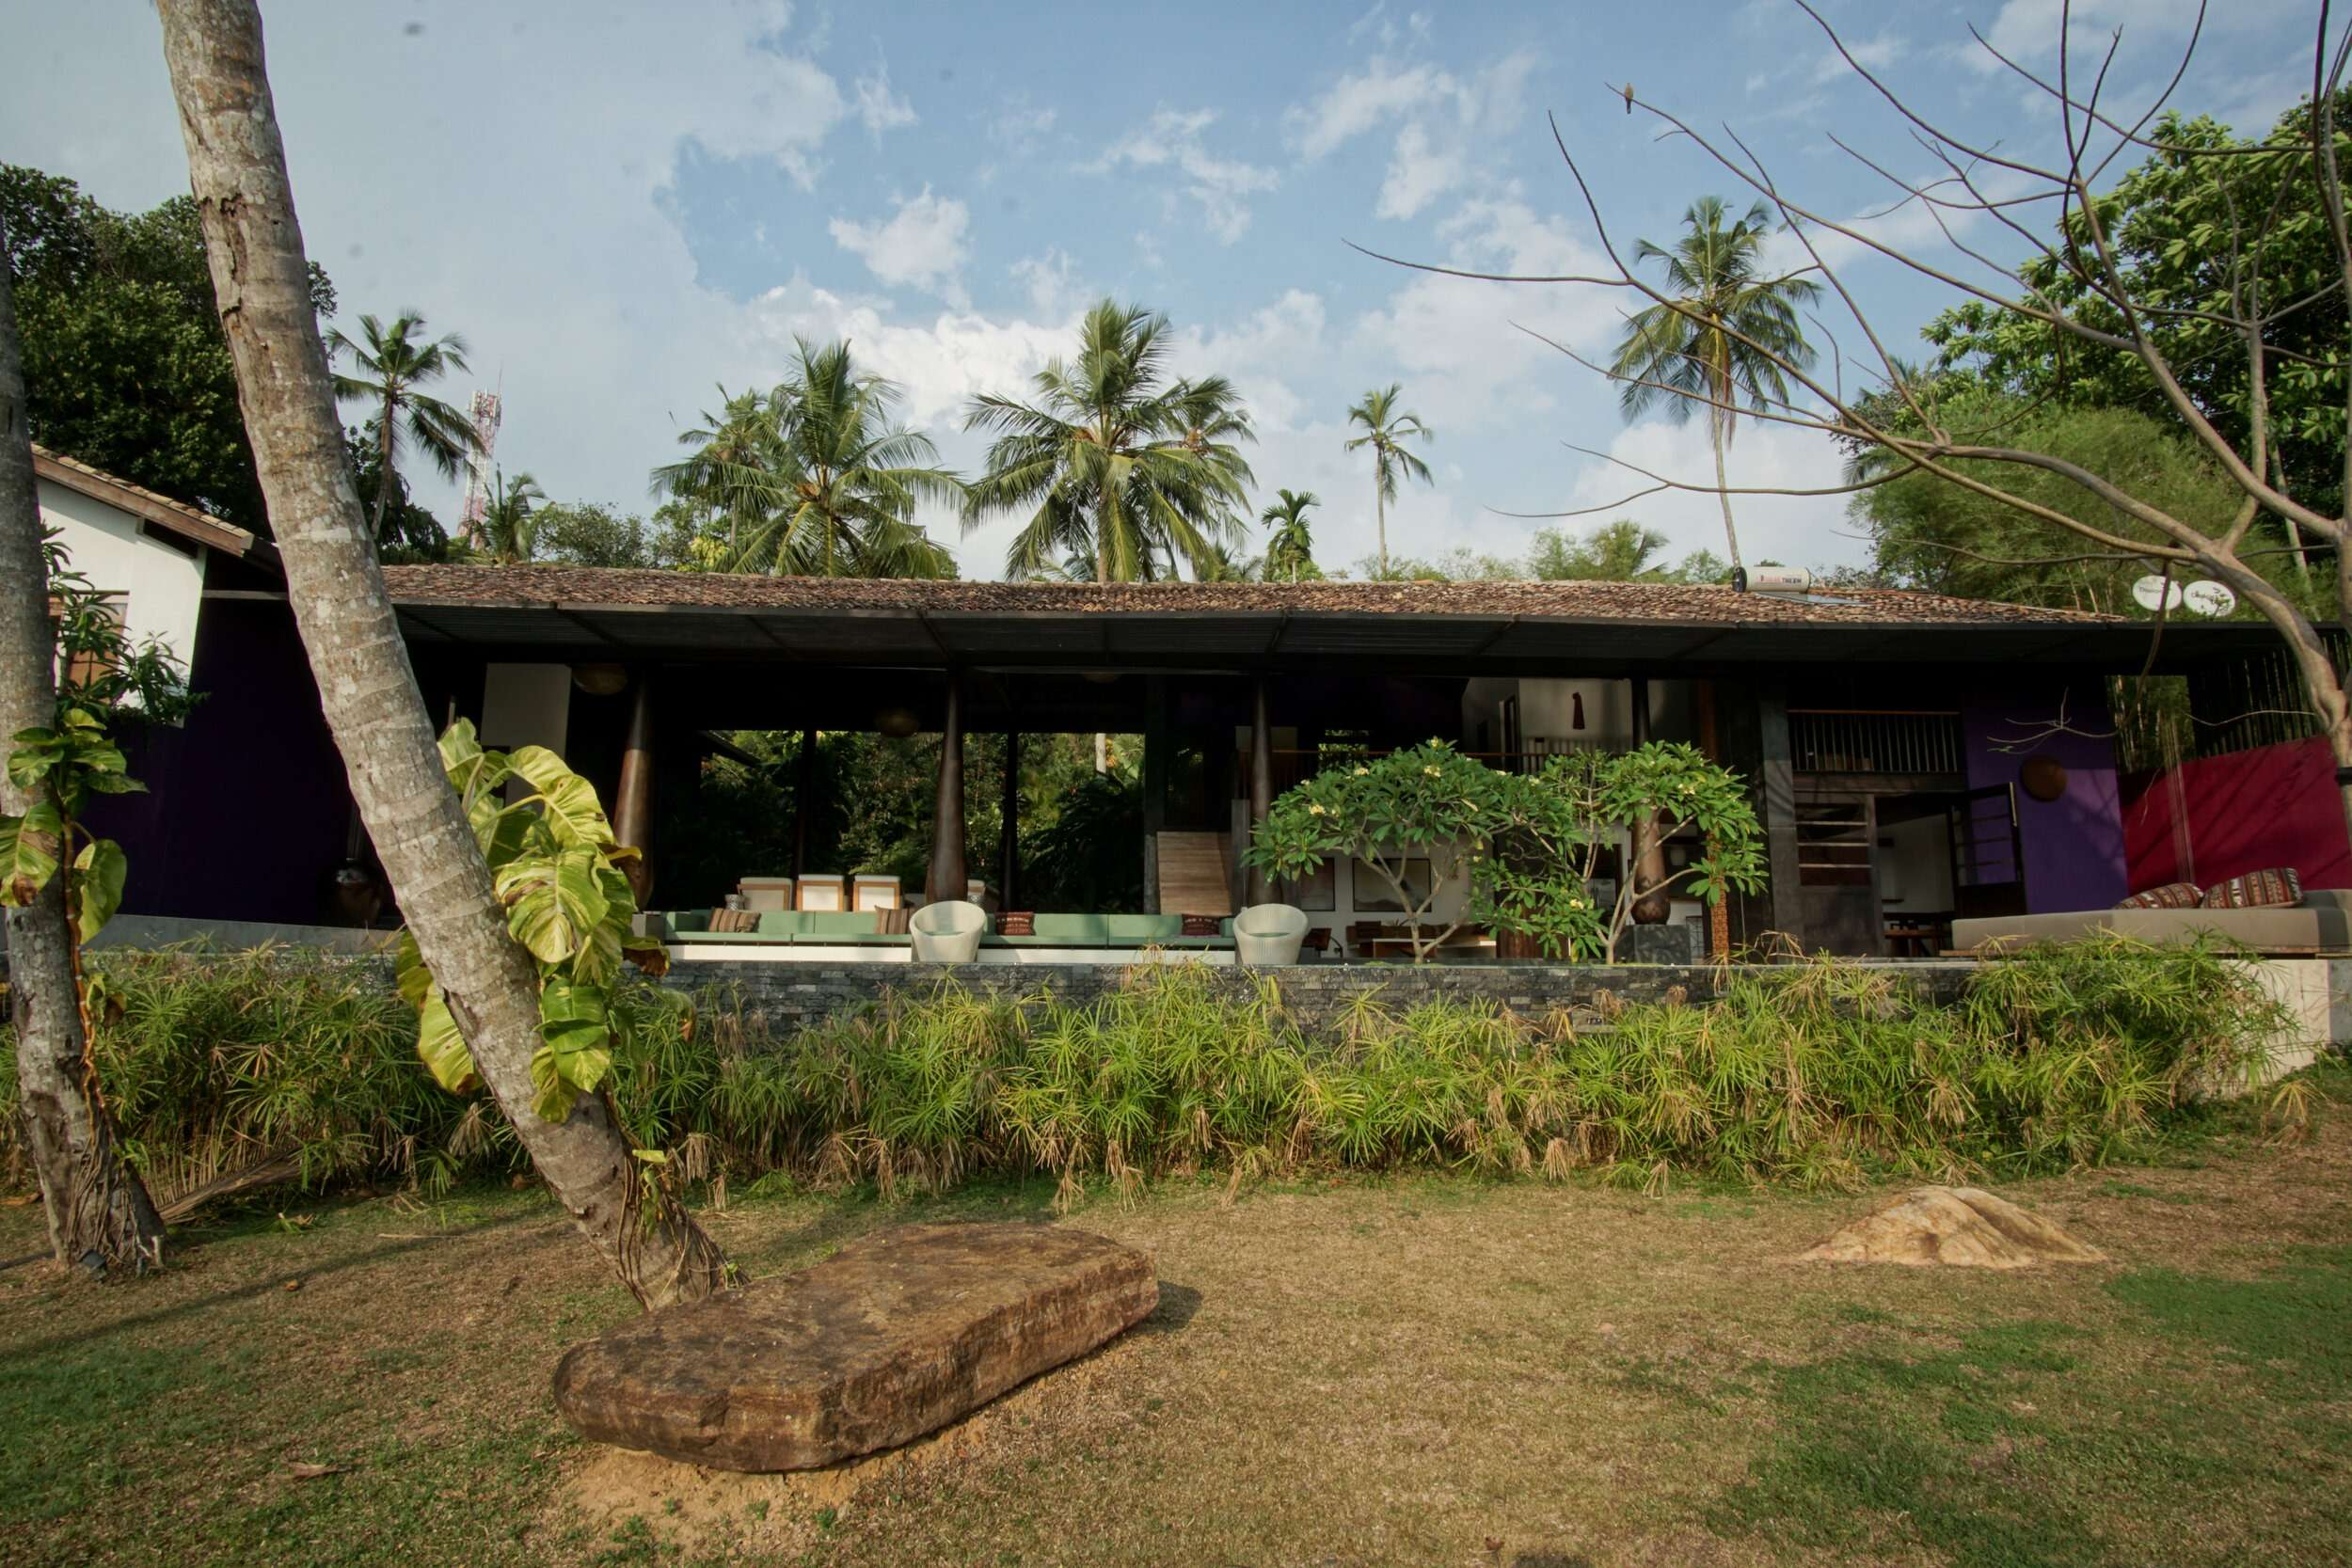 looking back towards Villa Wambatu, a villa surrounded by trees and plants